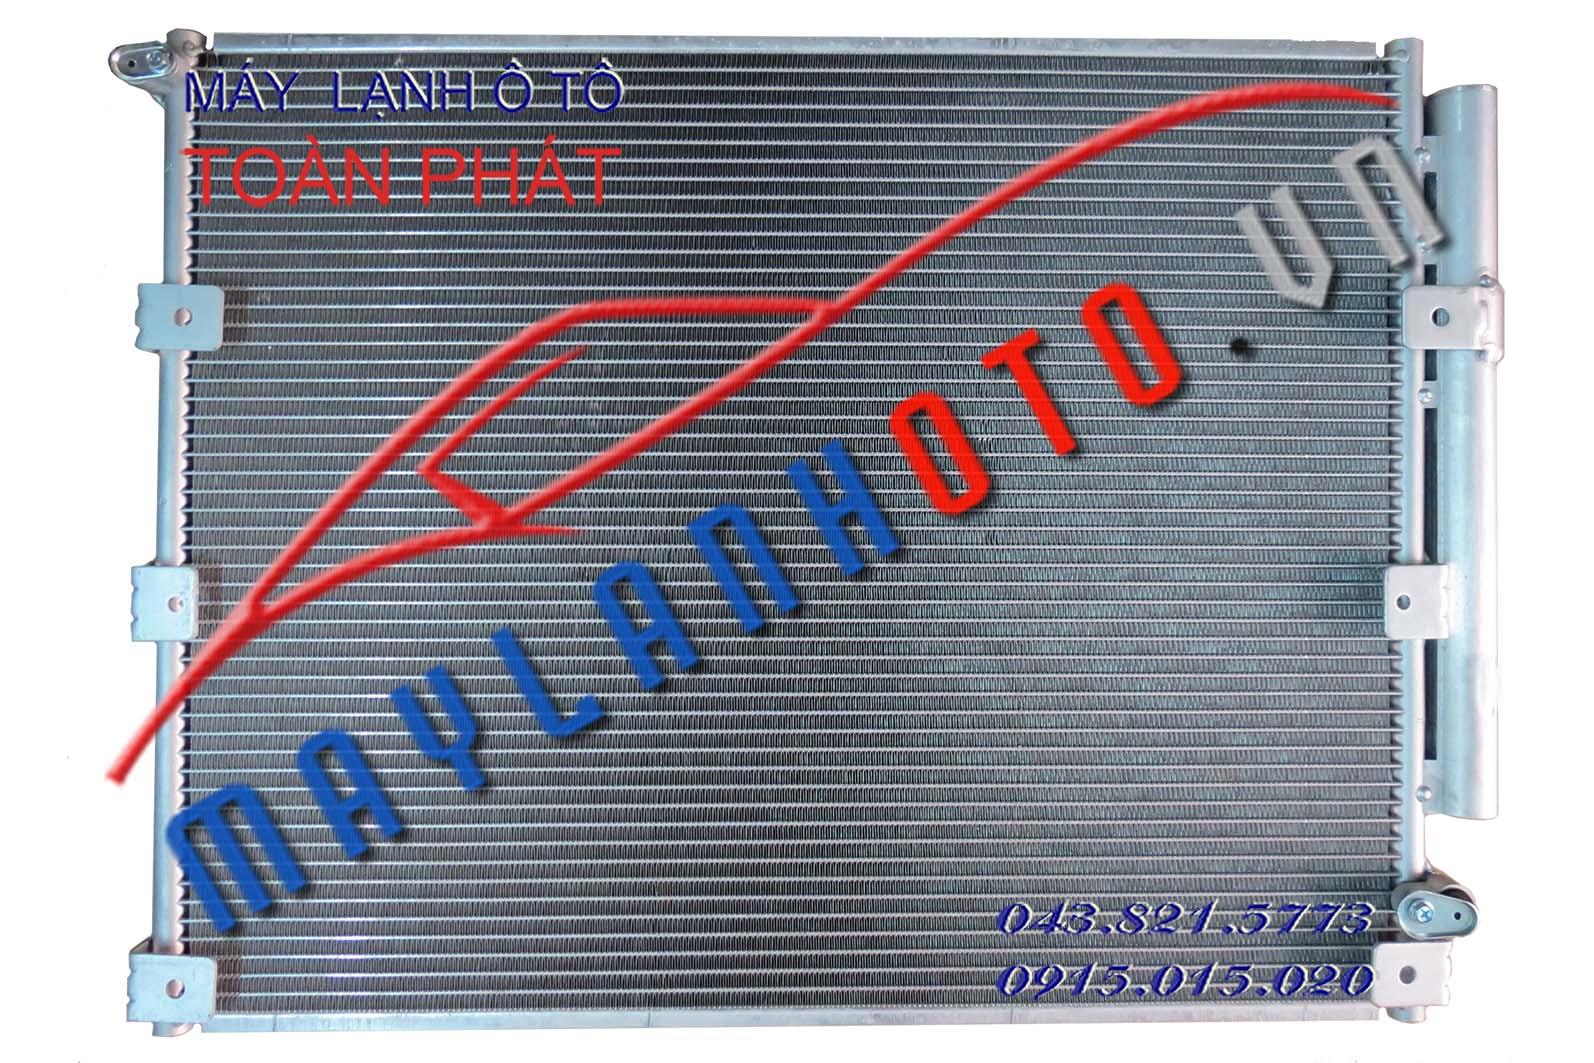 LandCruiser Prado 2006 / Giàn nóng điều hòa Toyota LandCruiser Prado 2006